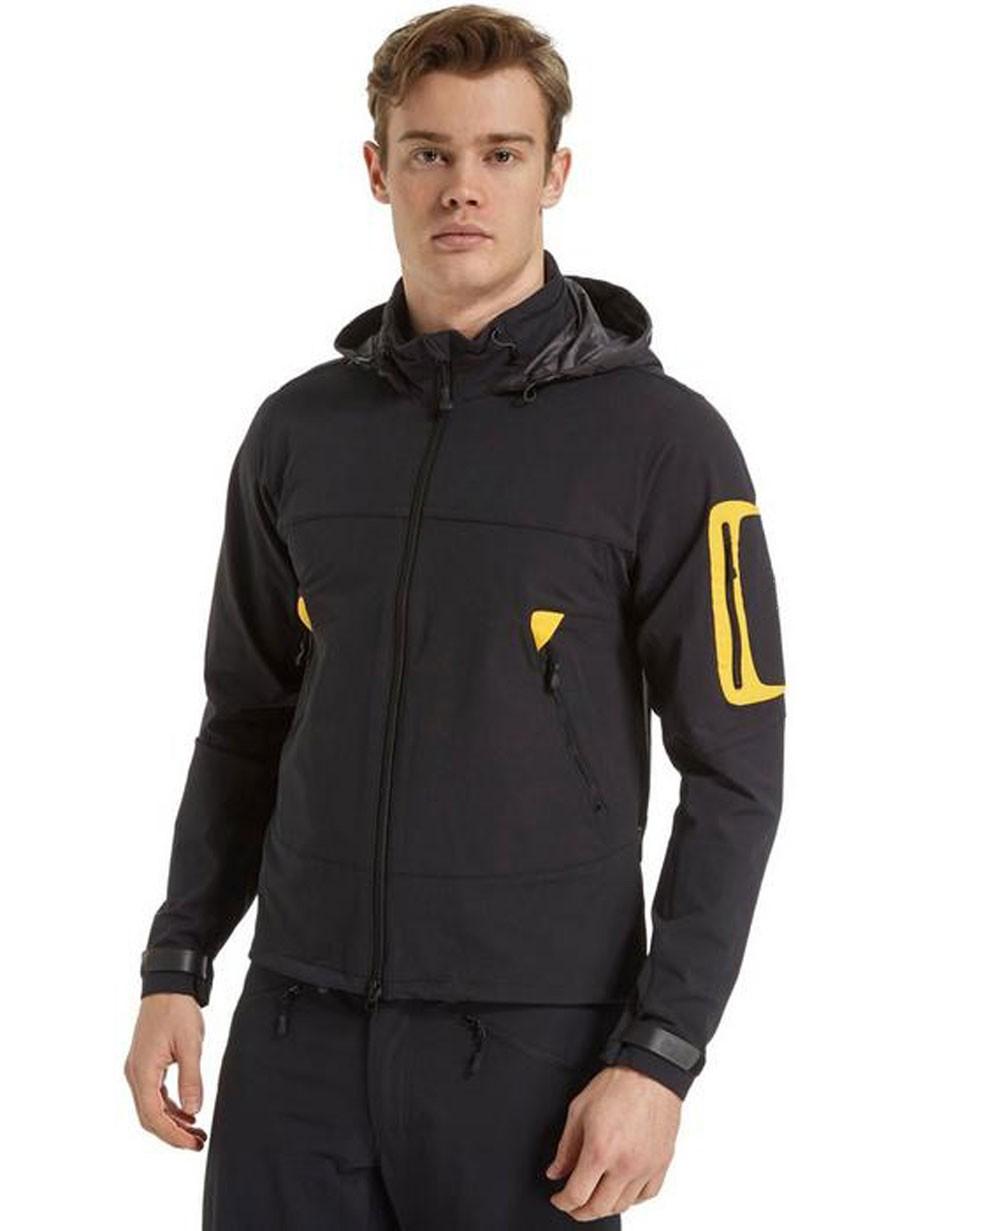 Men's Muddy Track Jacket